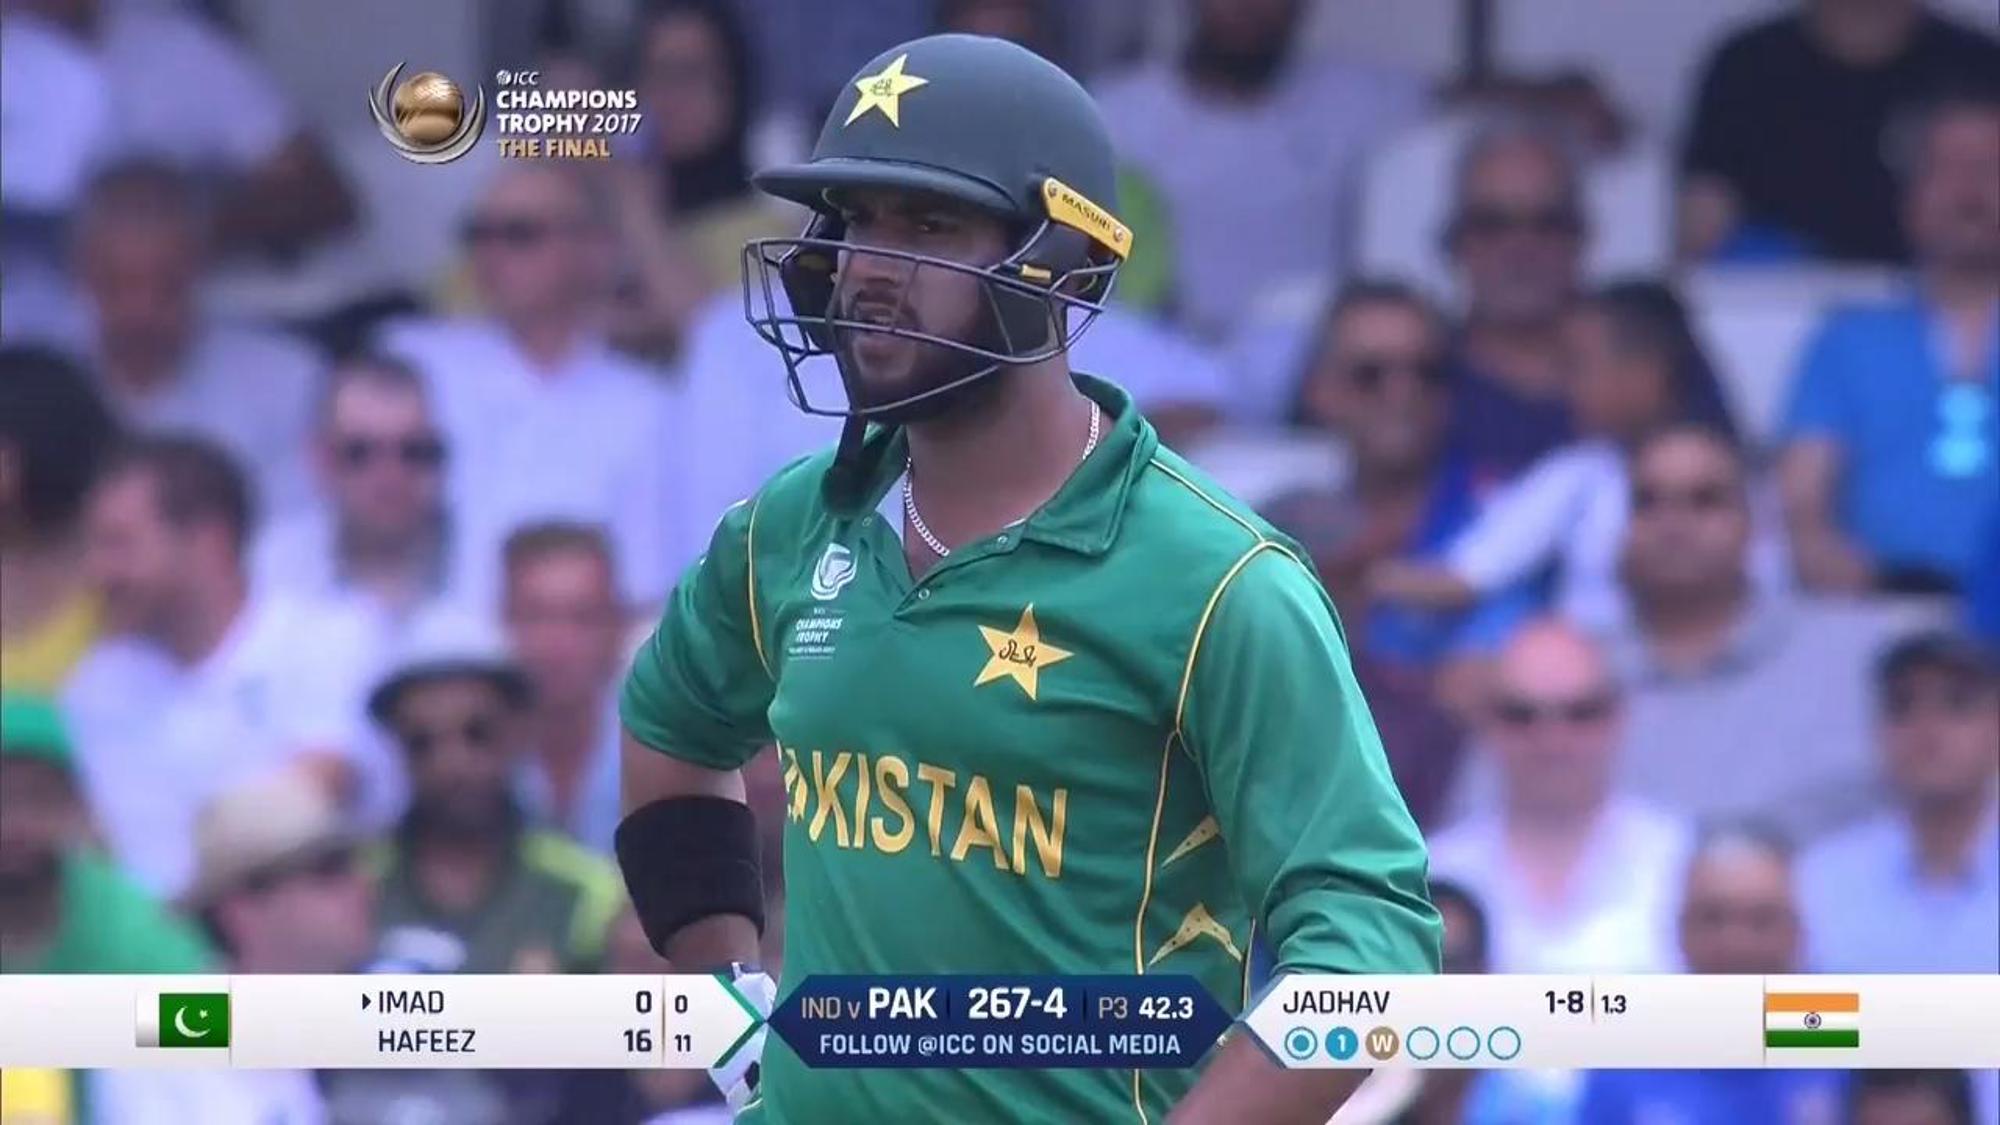 #CT17 Final - Pak v Ind: Imad Wasim innings